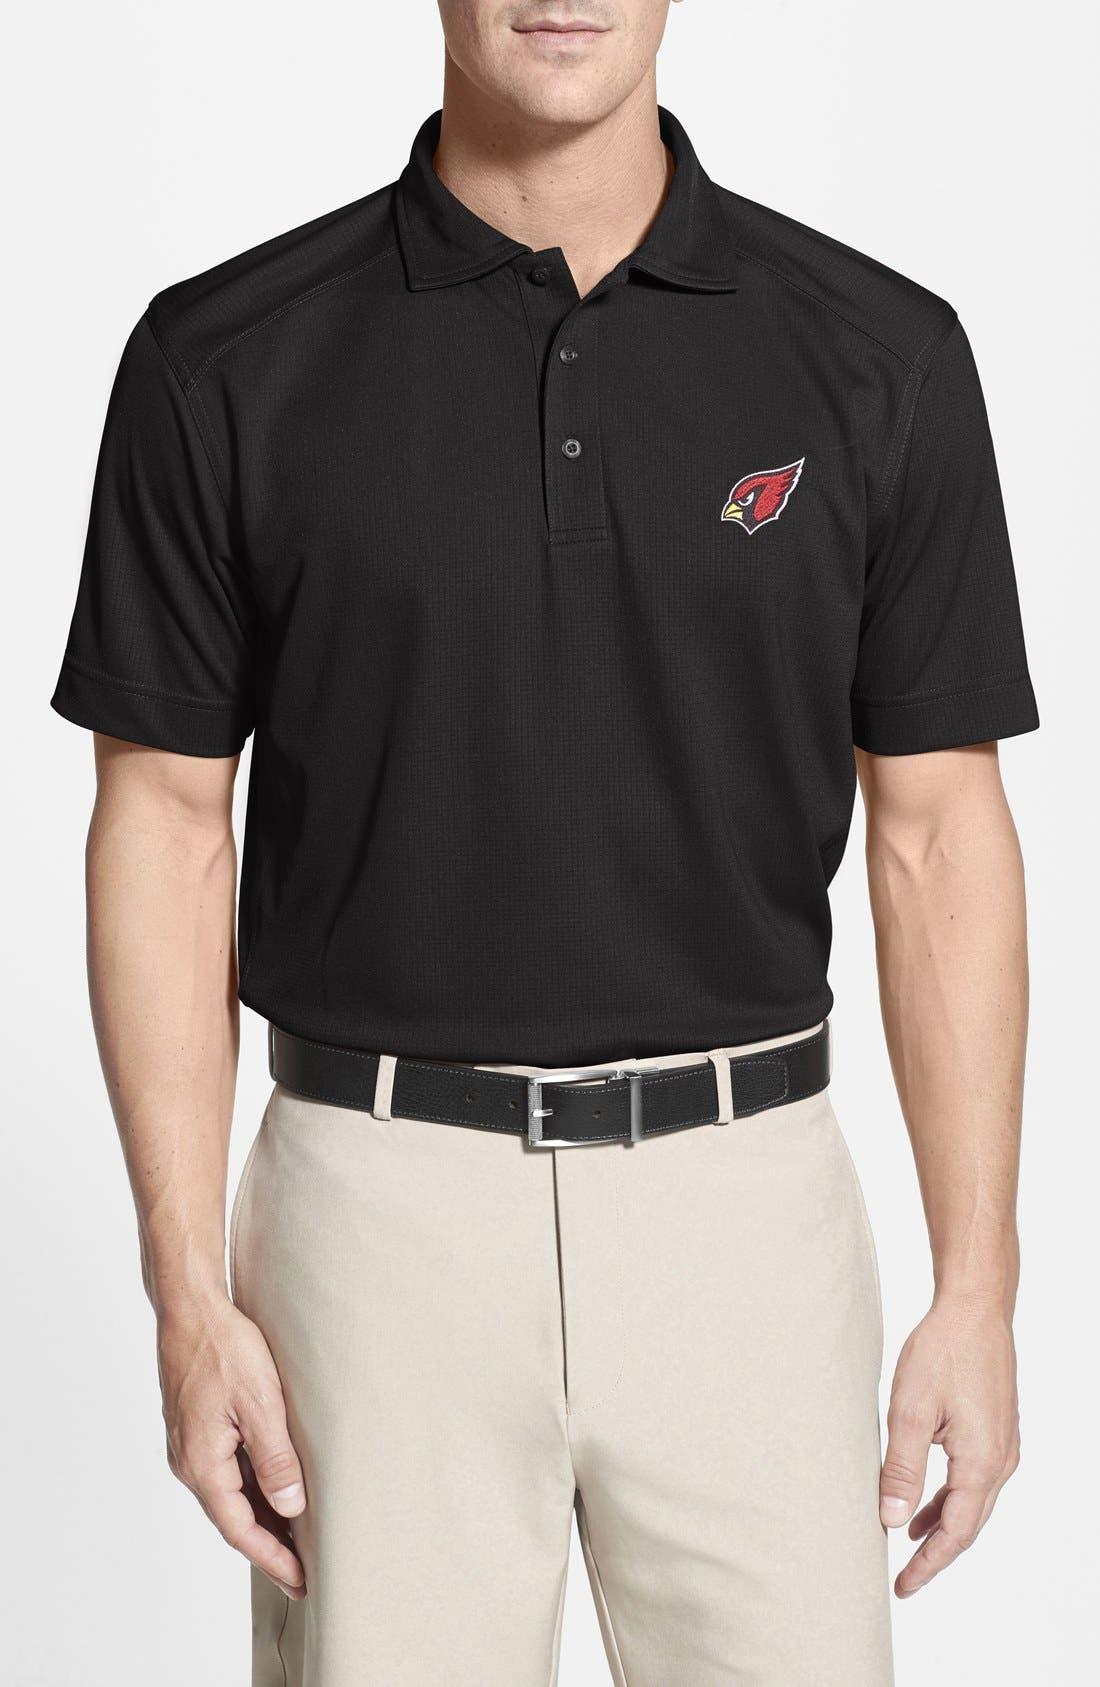 Arizona Cardinals - Genre DryTec Moisture Wicking Polo,                         Main,                         color, 001